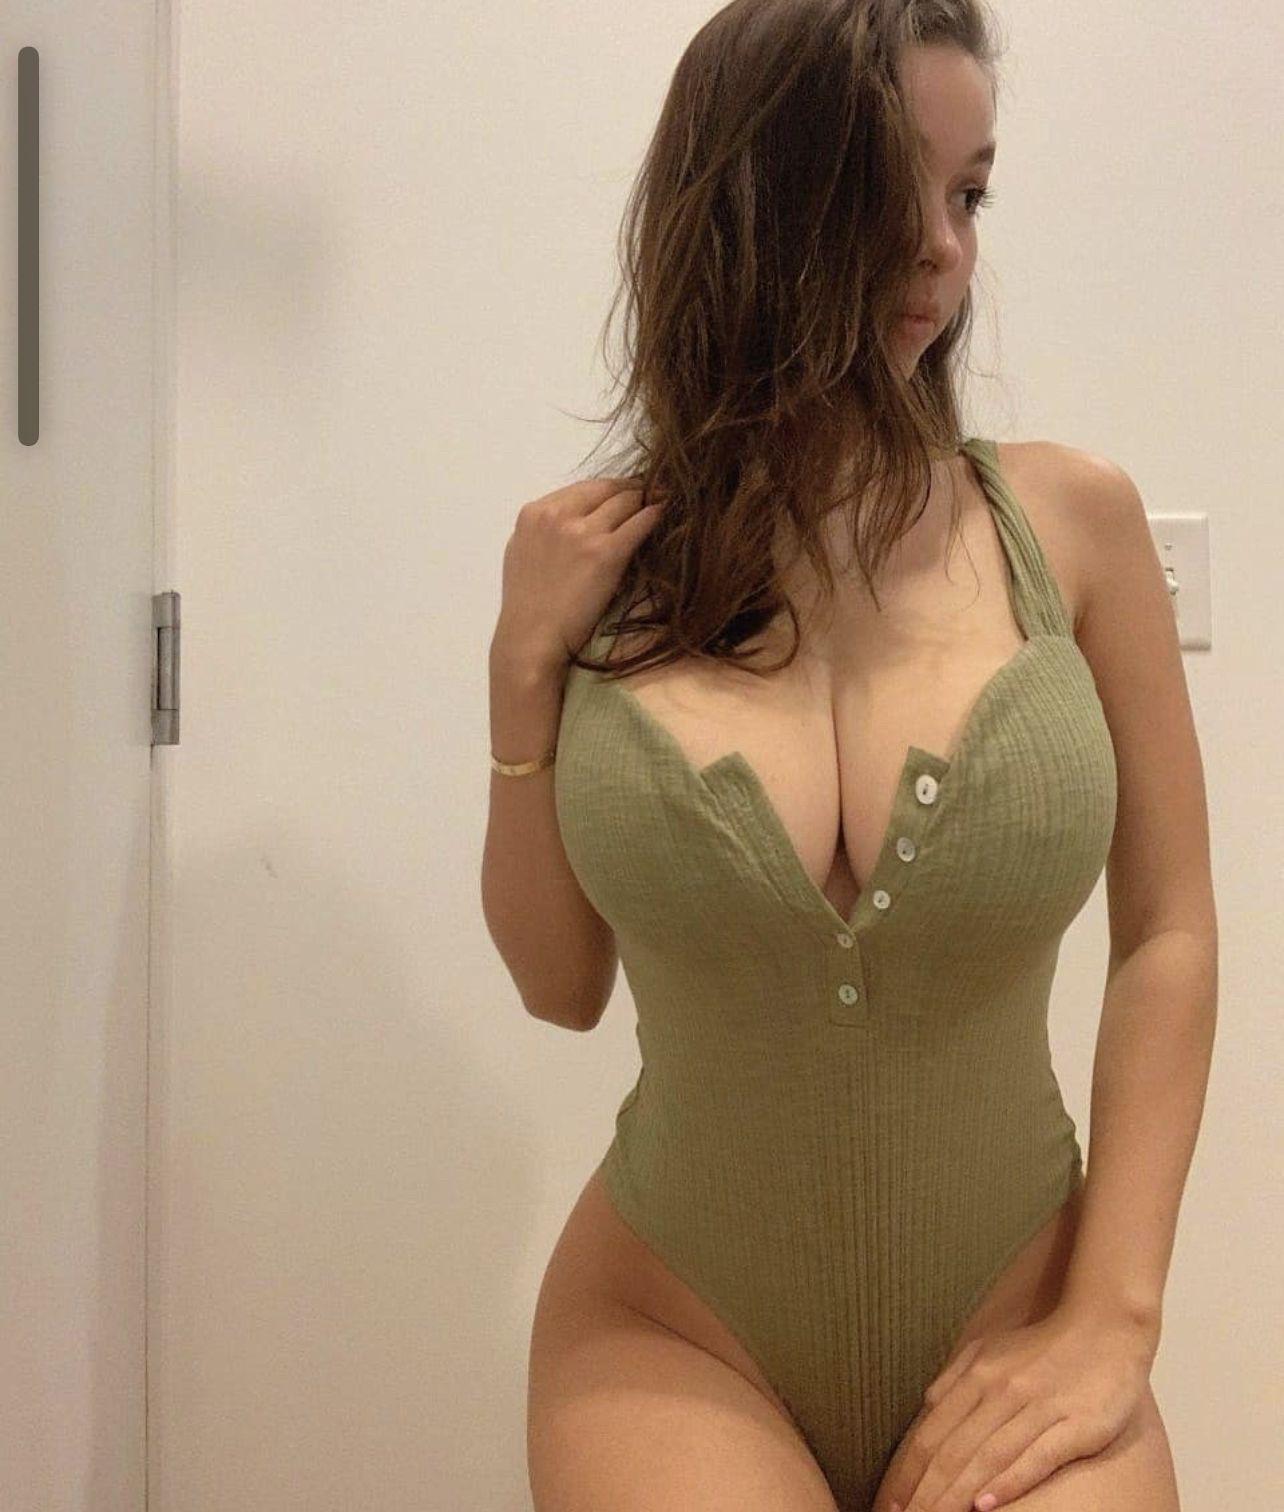 Sophie Mudd Big Breasts